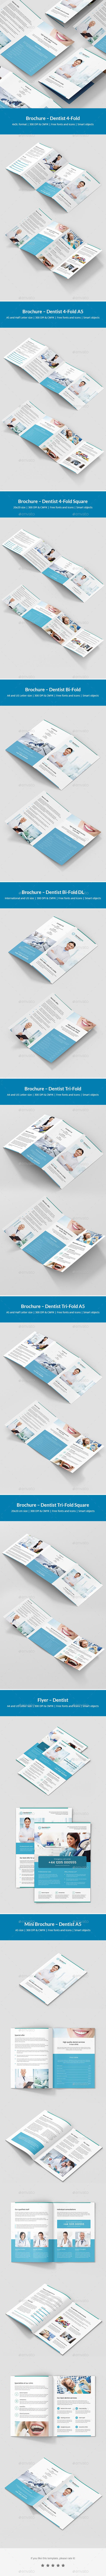 Dentist – Brochures Bundle Print Templates 10 in 1 - Informational Brochures